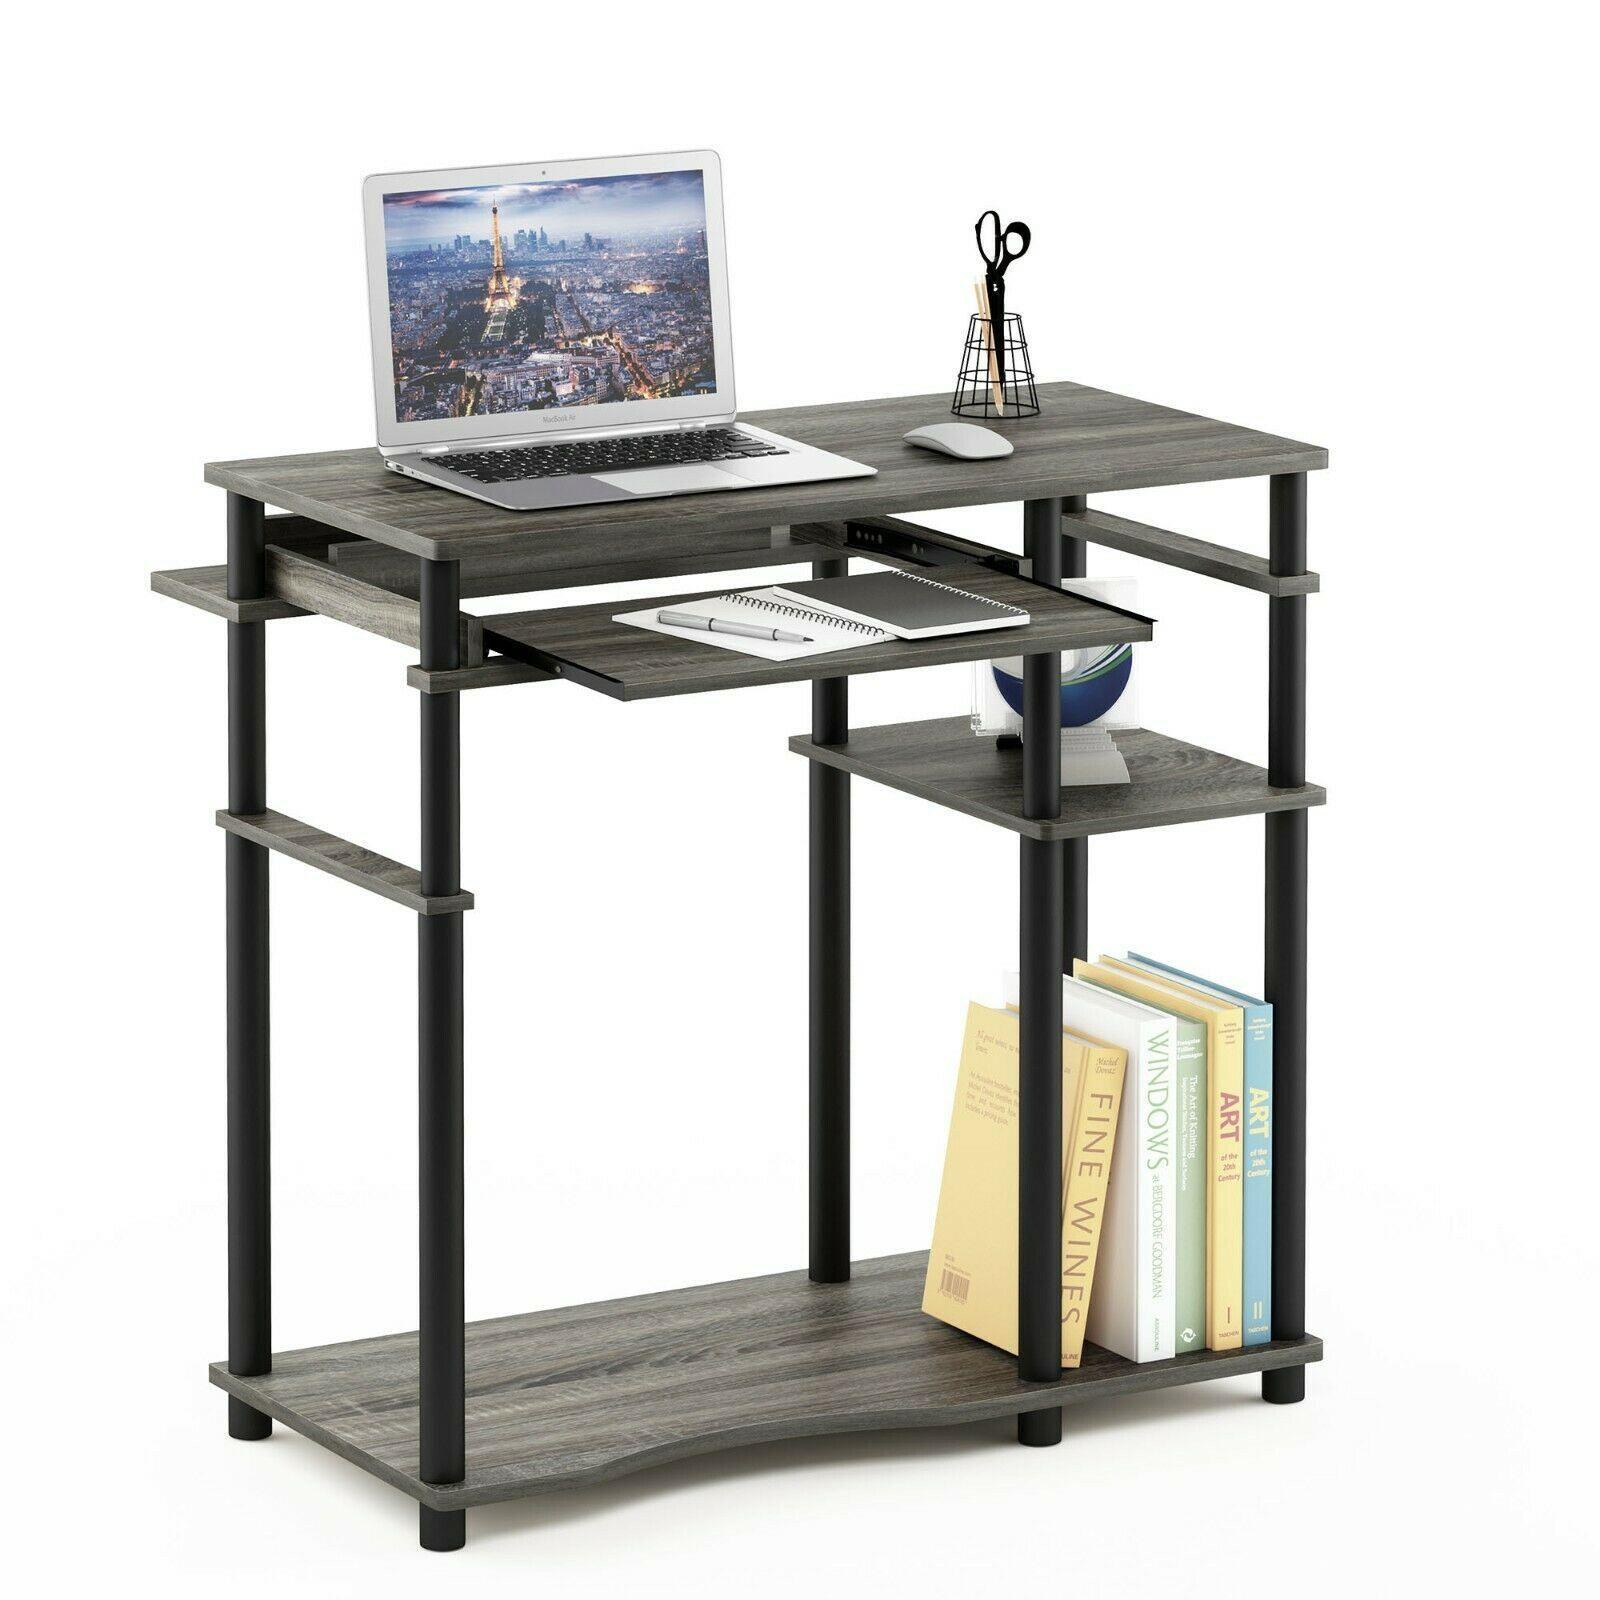 Furinno Abbott Computer Desk with Bookshelf - French Oak Grey/Black